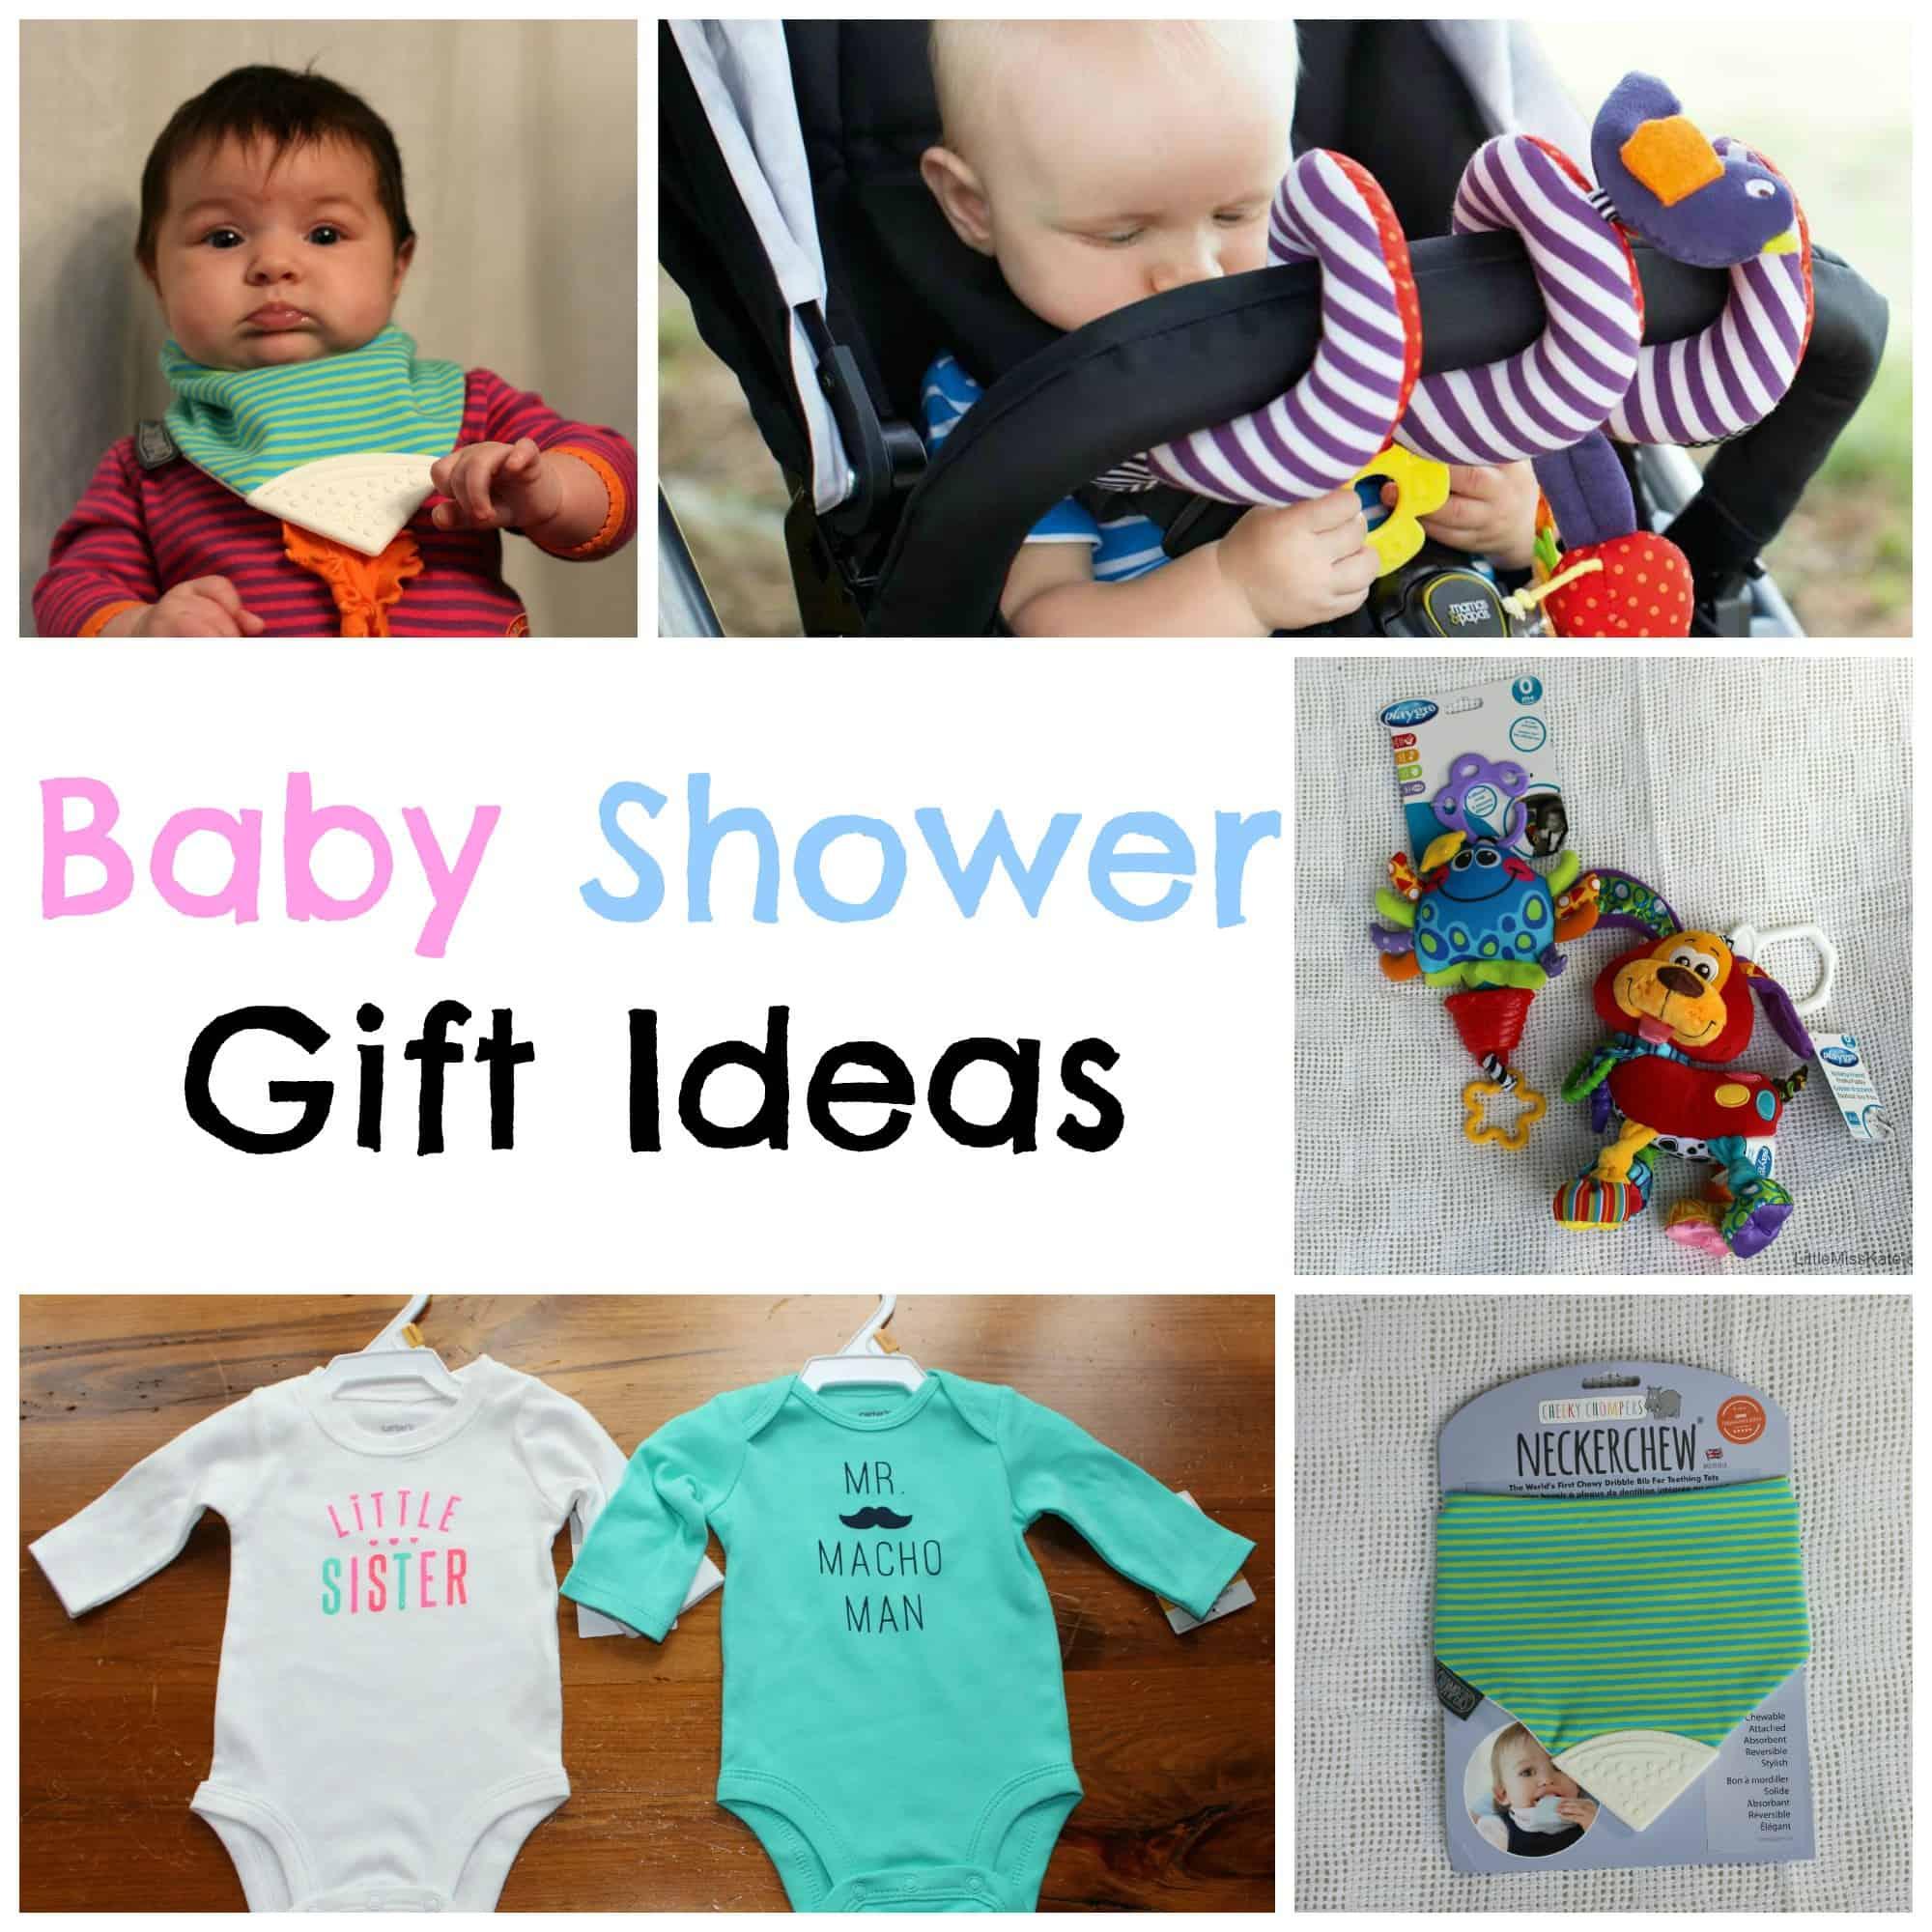 5 Baby Shower Gift Ideas